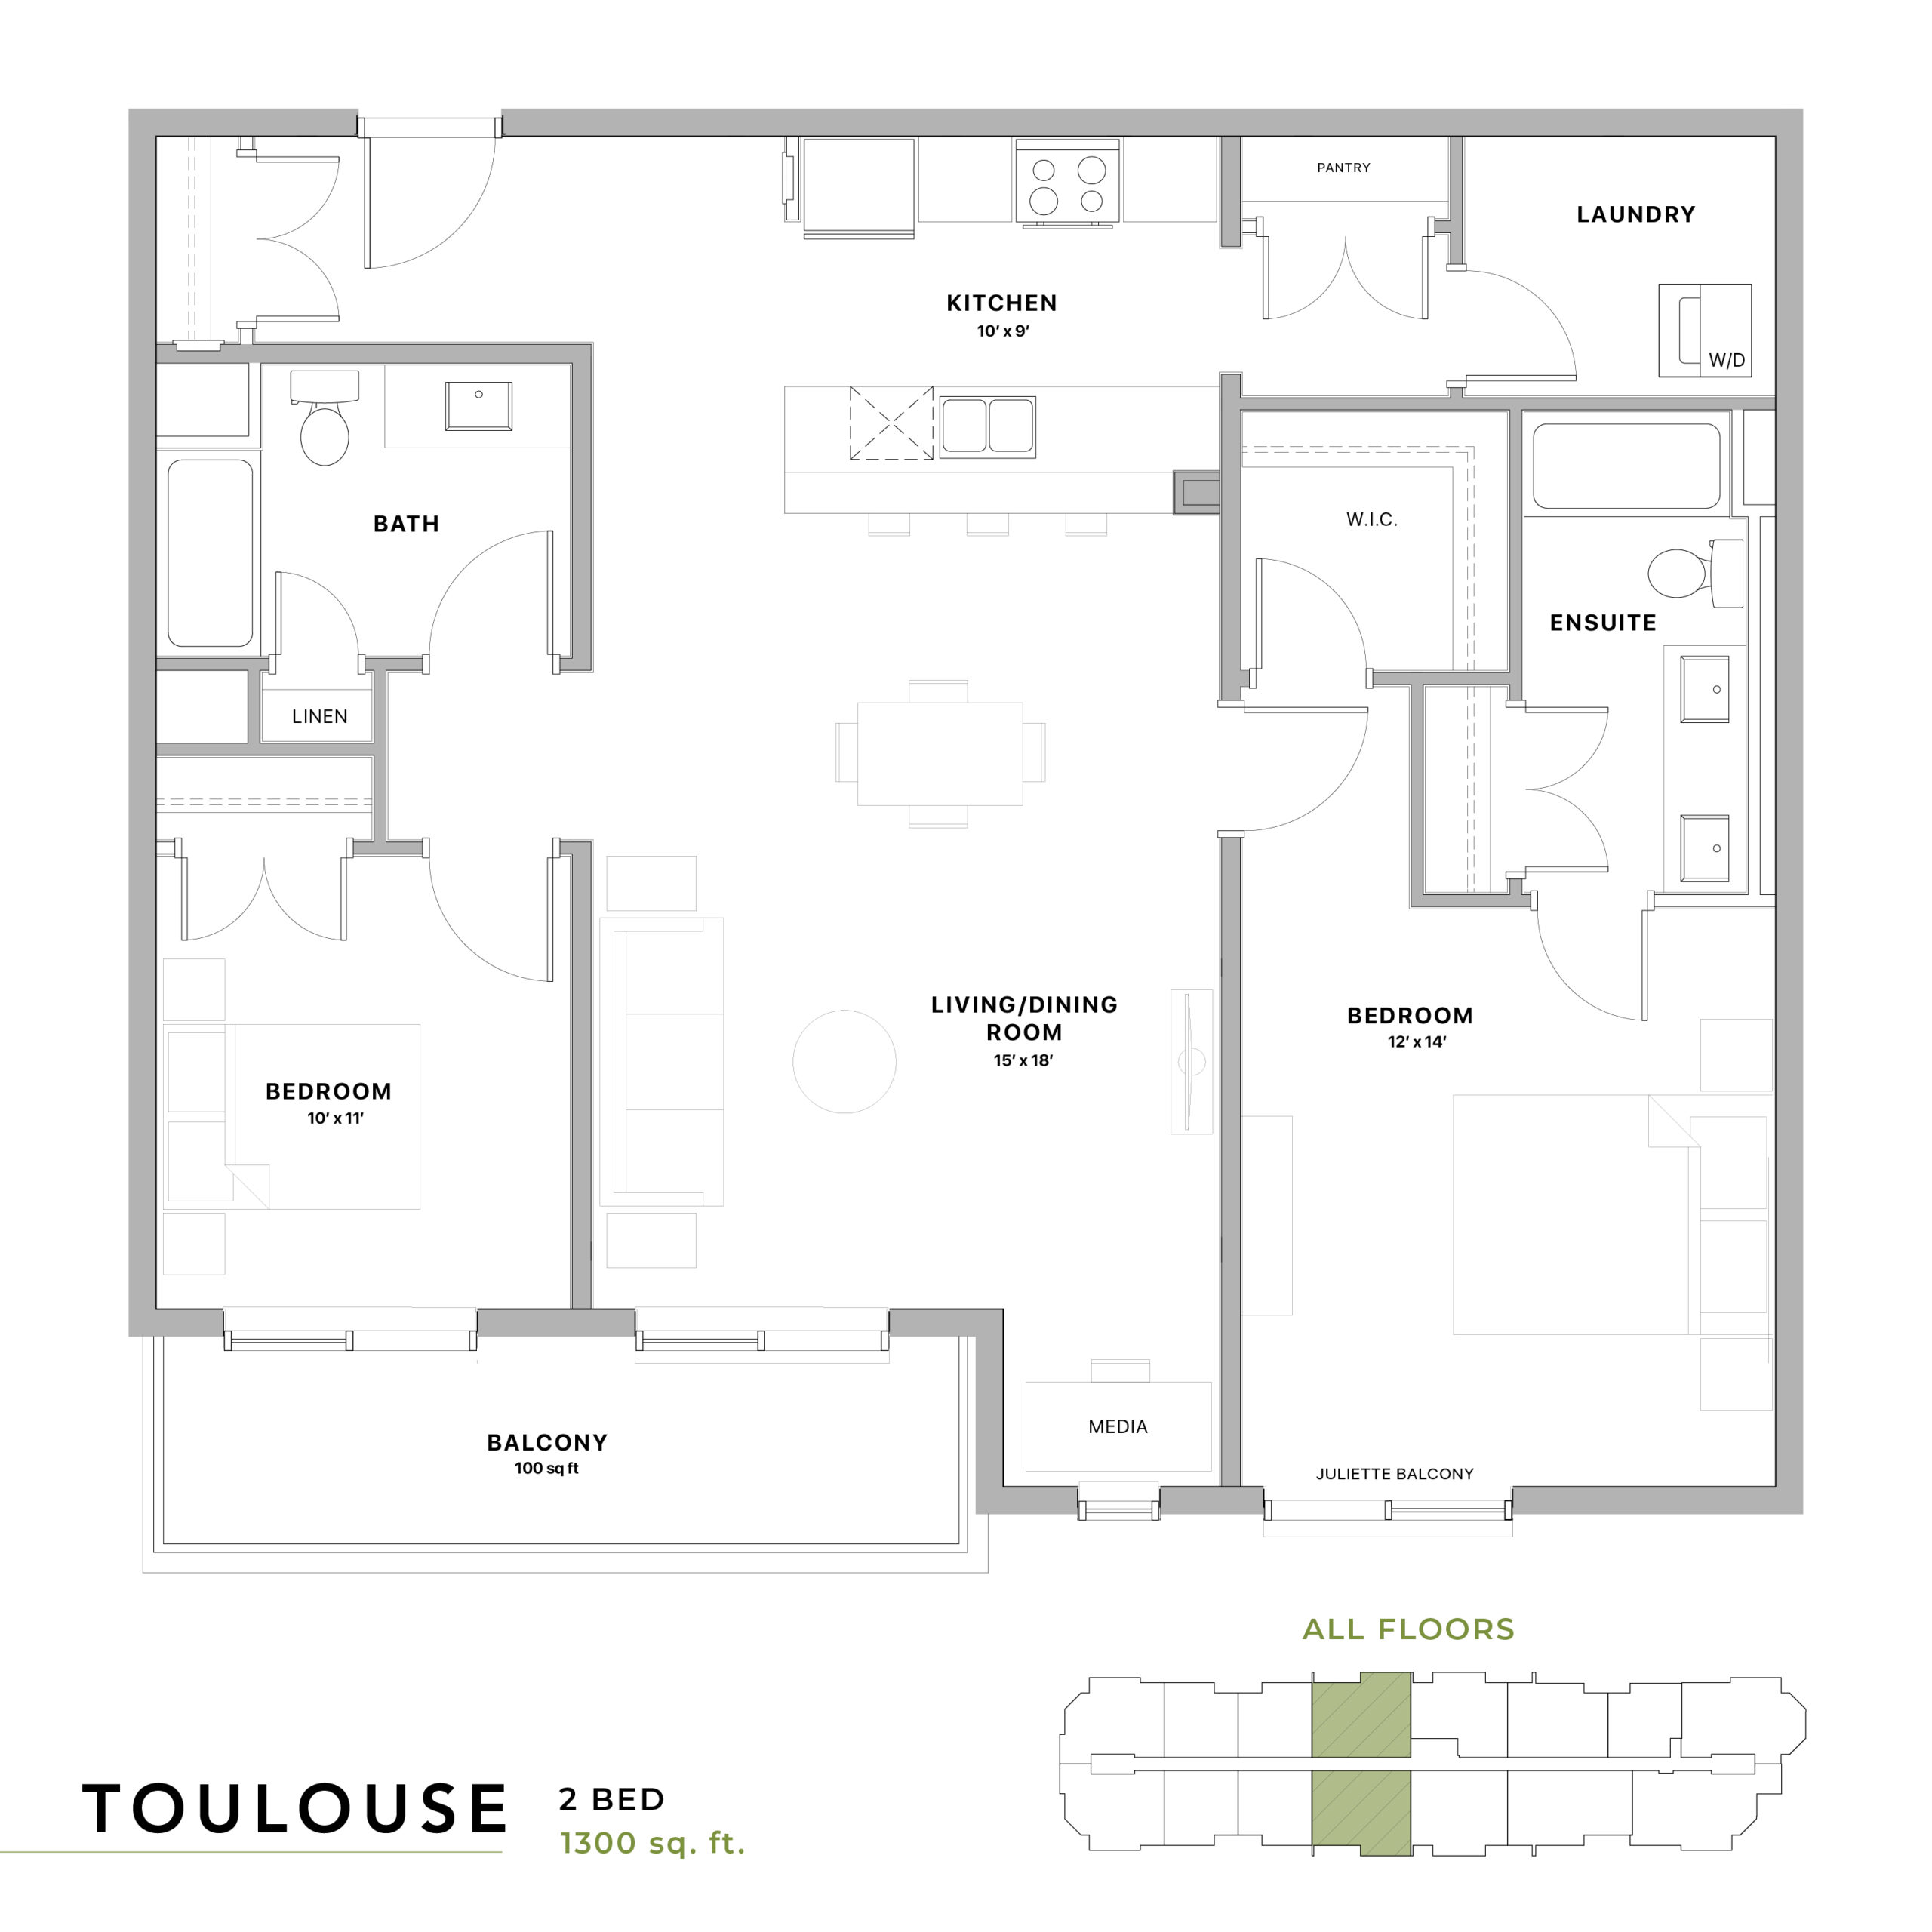 Toulouse Floorplan